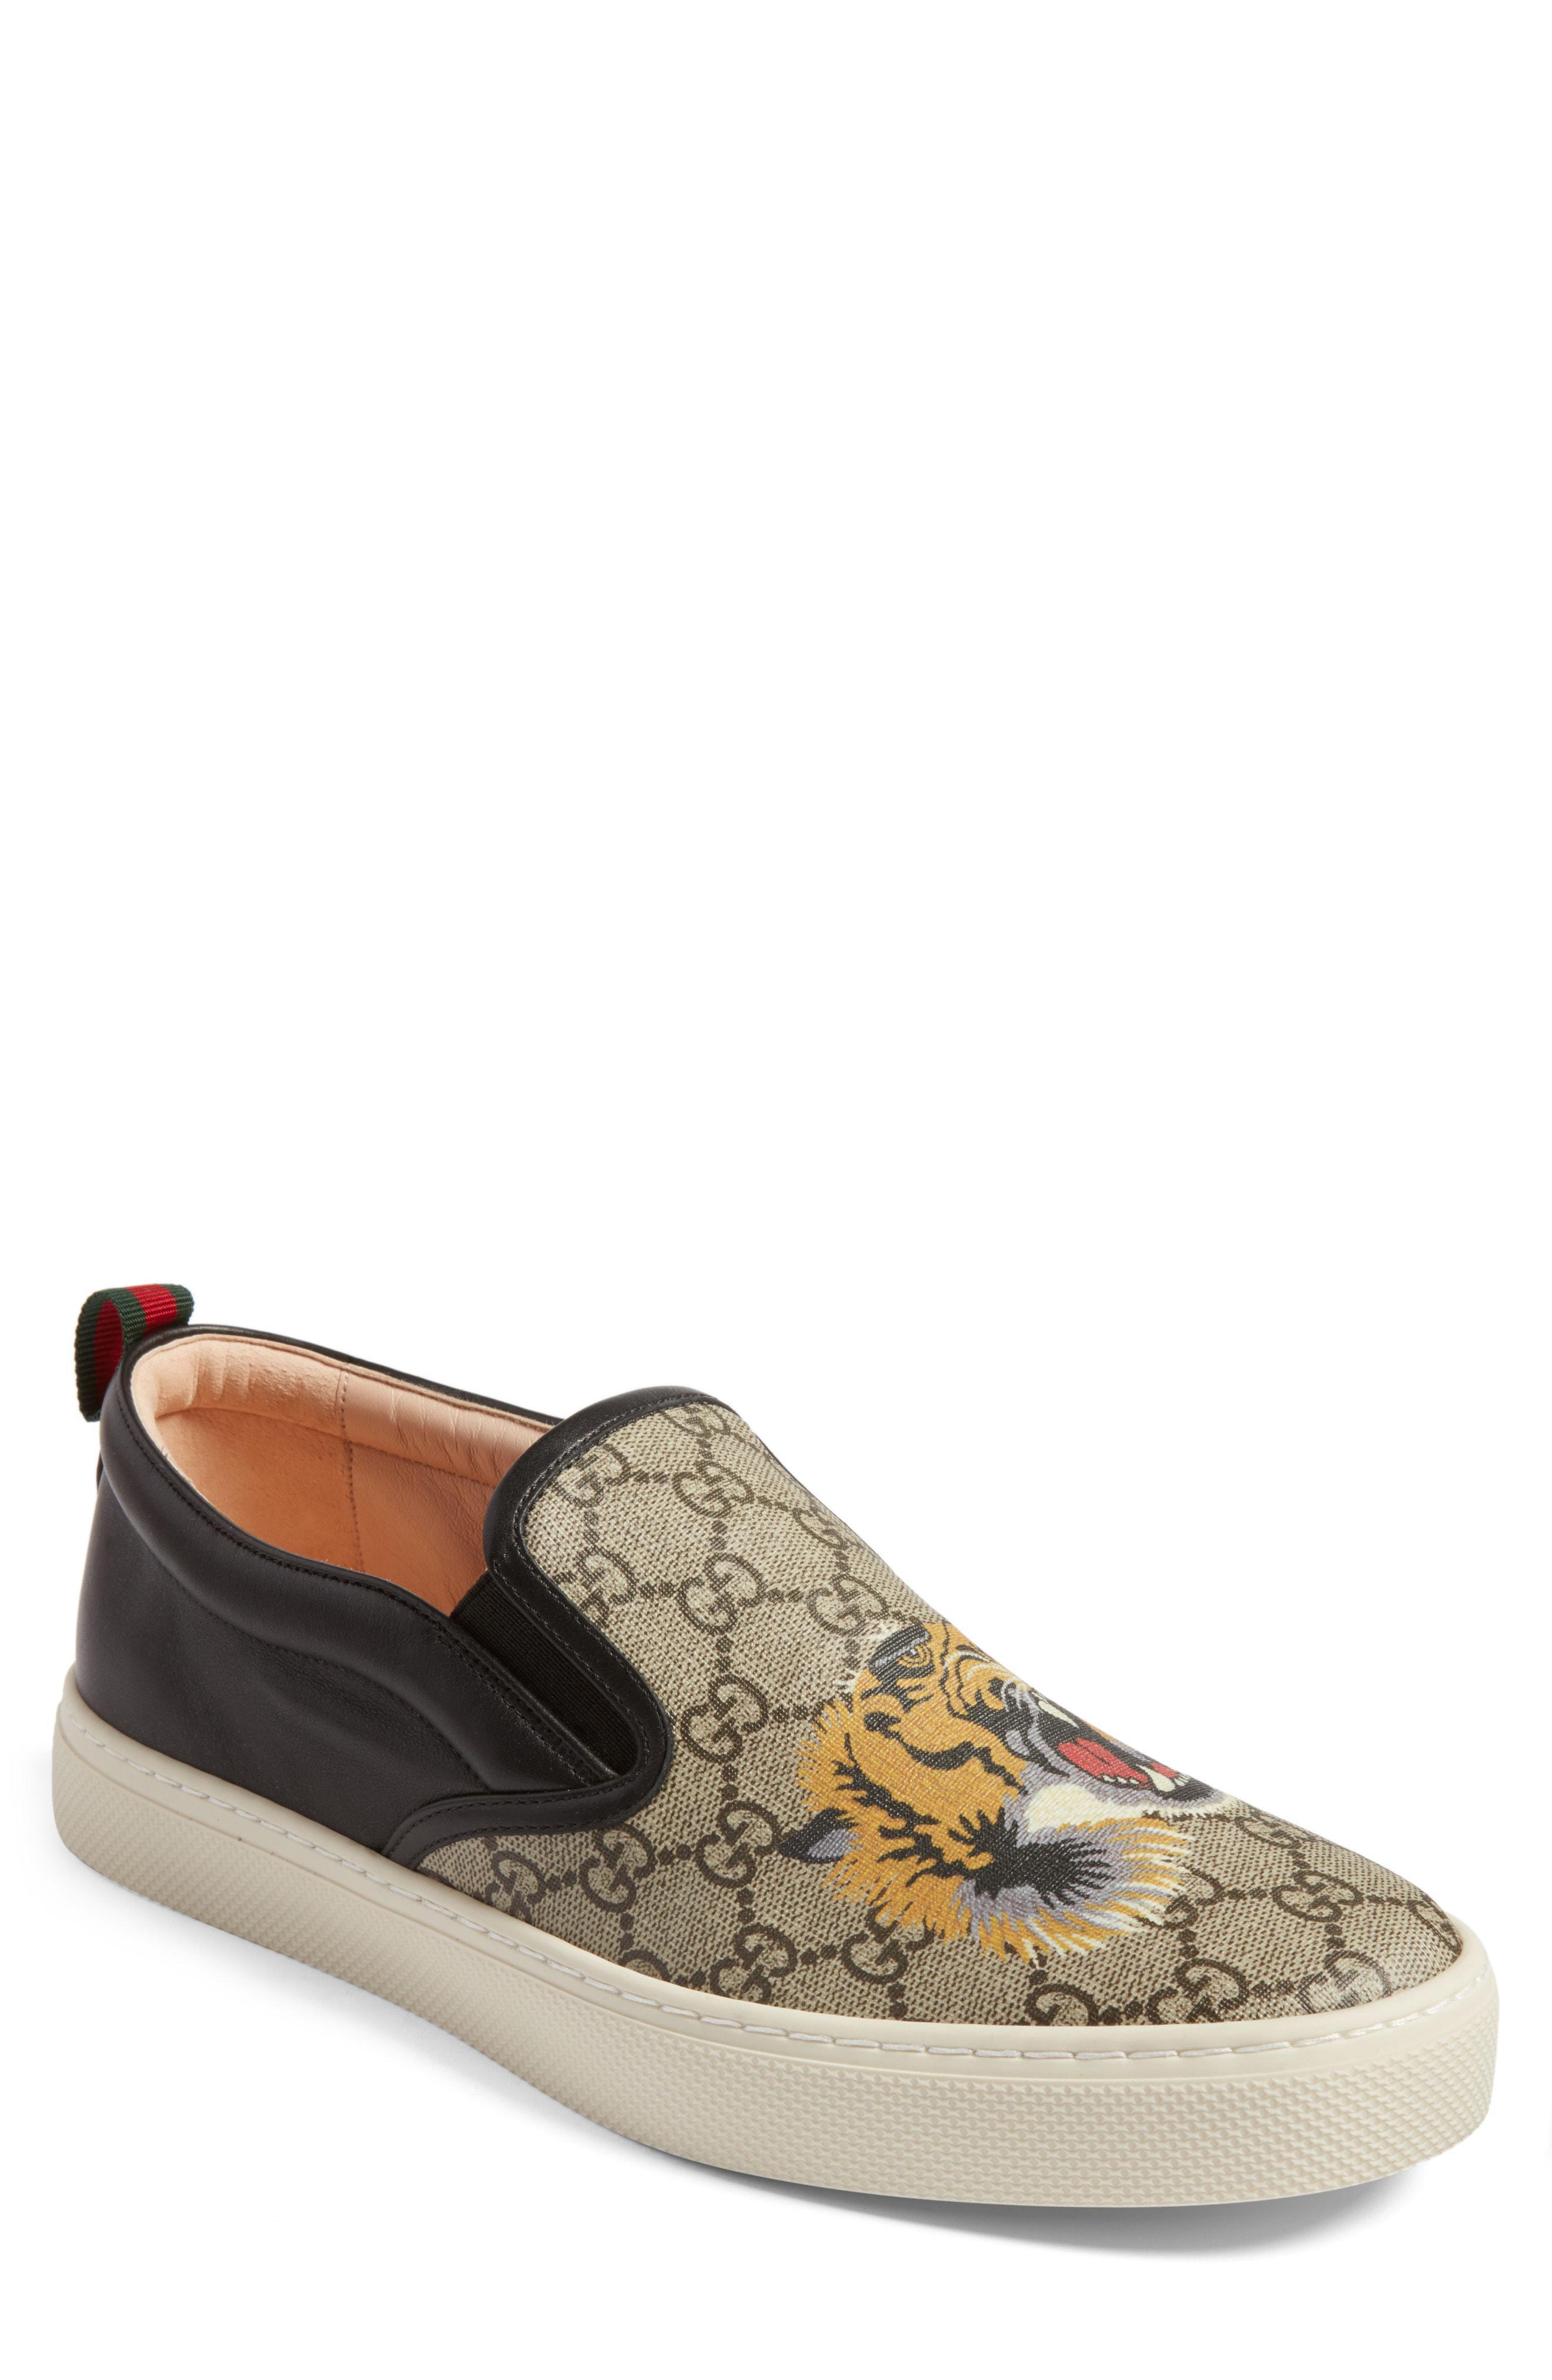 947cd0eb285 Lyst - Gucci Dublin Slip-on Sneaker in Brown for Men